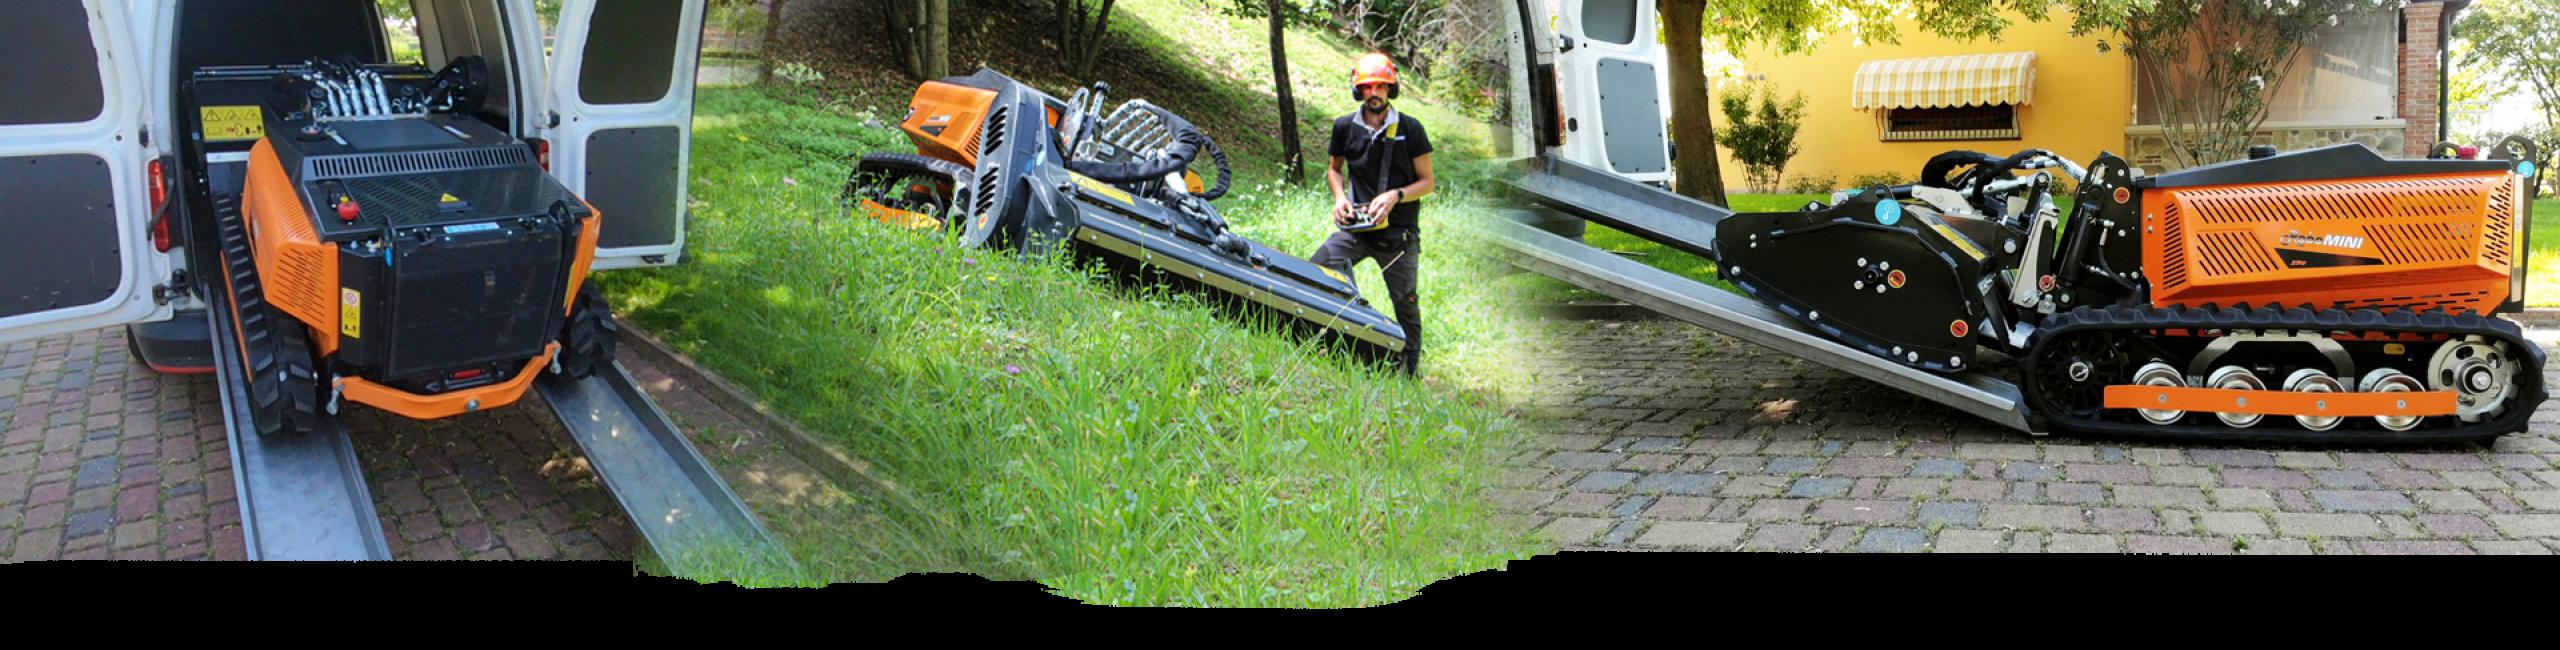 robomini - compact machine - remote controlled mower - energreen america professional machines